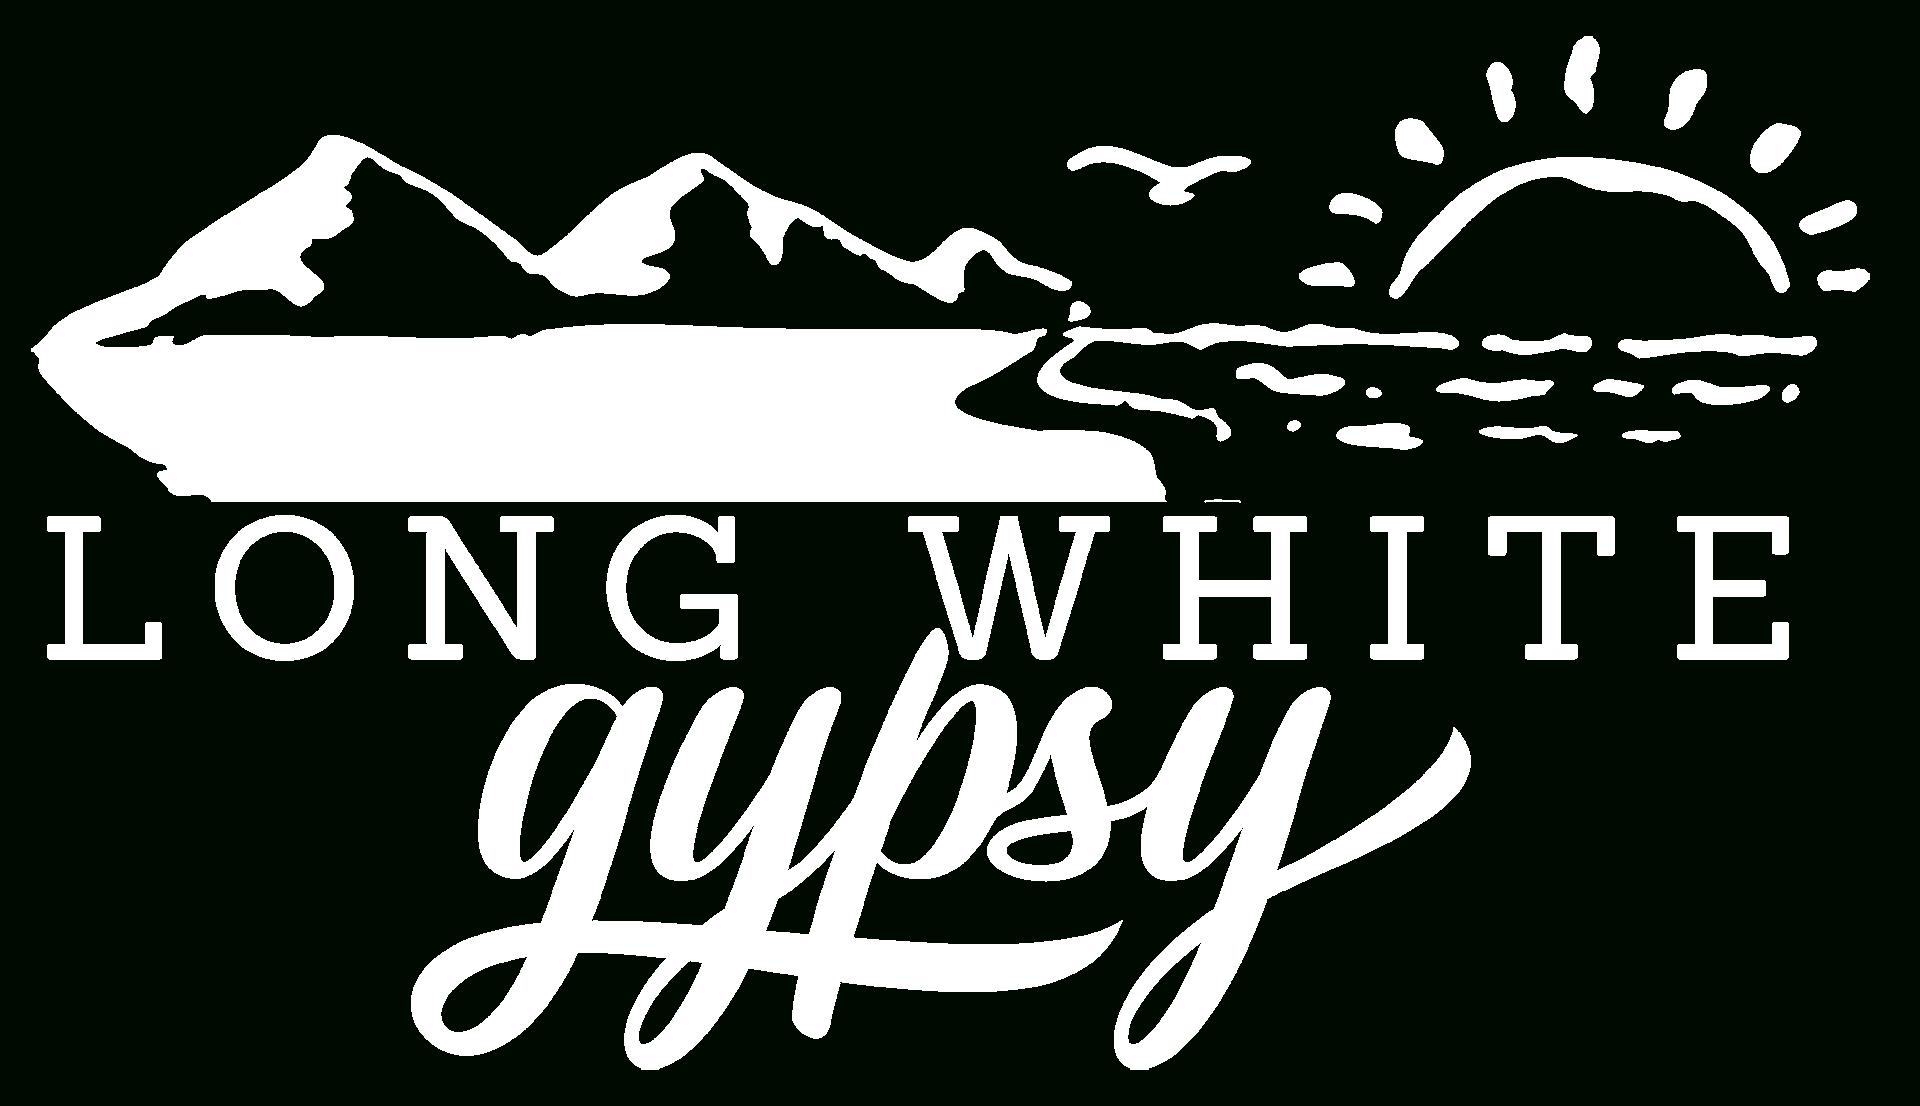 Te Araroa Countdown: Tminus 1 Month  Long White Gypsy within Countdown Minus Weekends